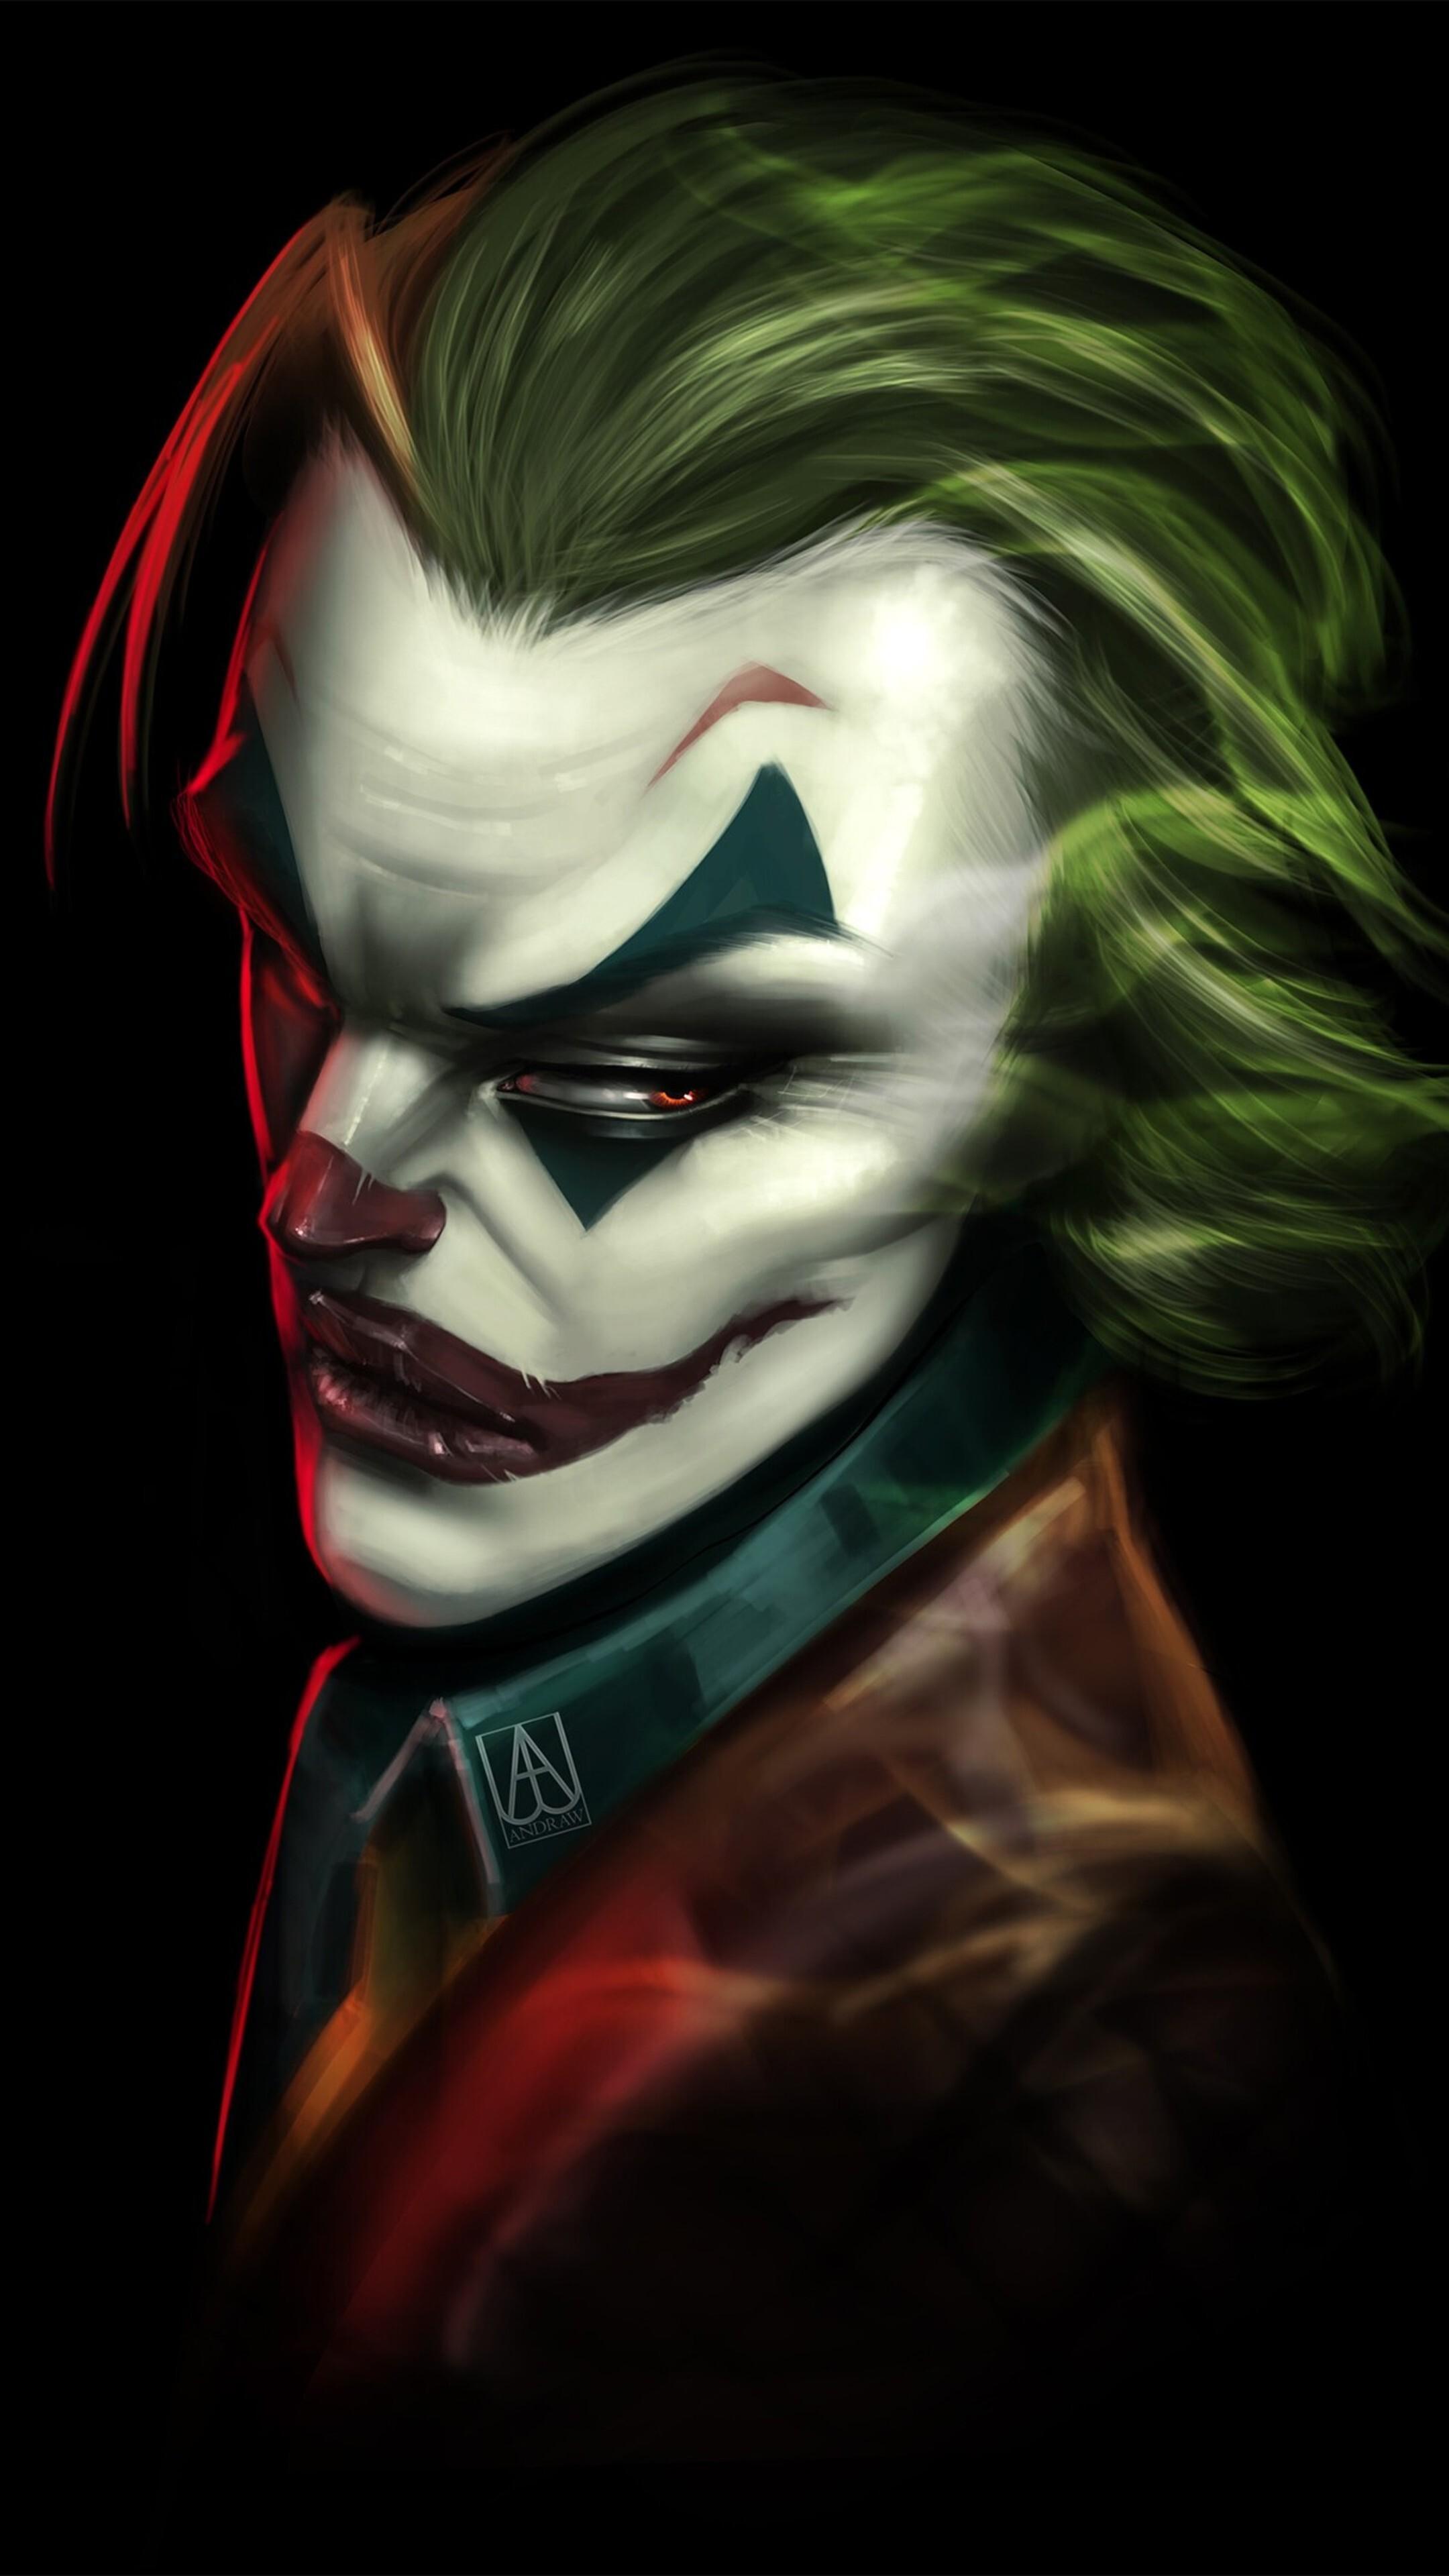 Best Joker 4k Mobile Wallpapers - Wallpaper Cave